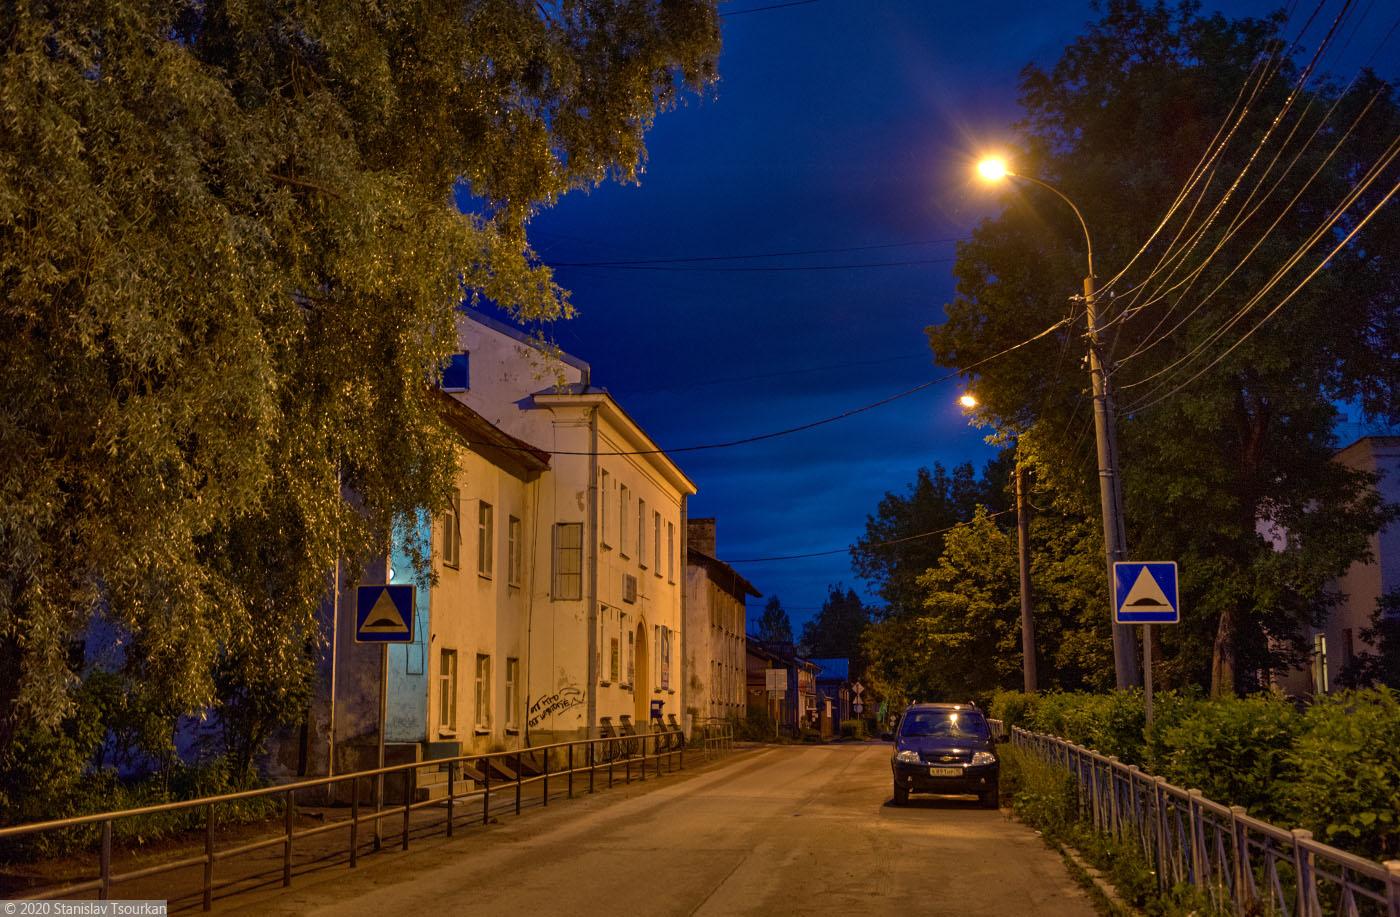 Сортавала, Карелия, республика Карелия, вечер, вечер в городе, улица Горького